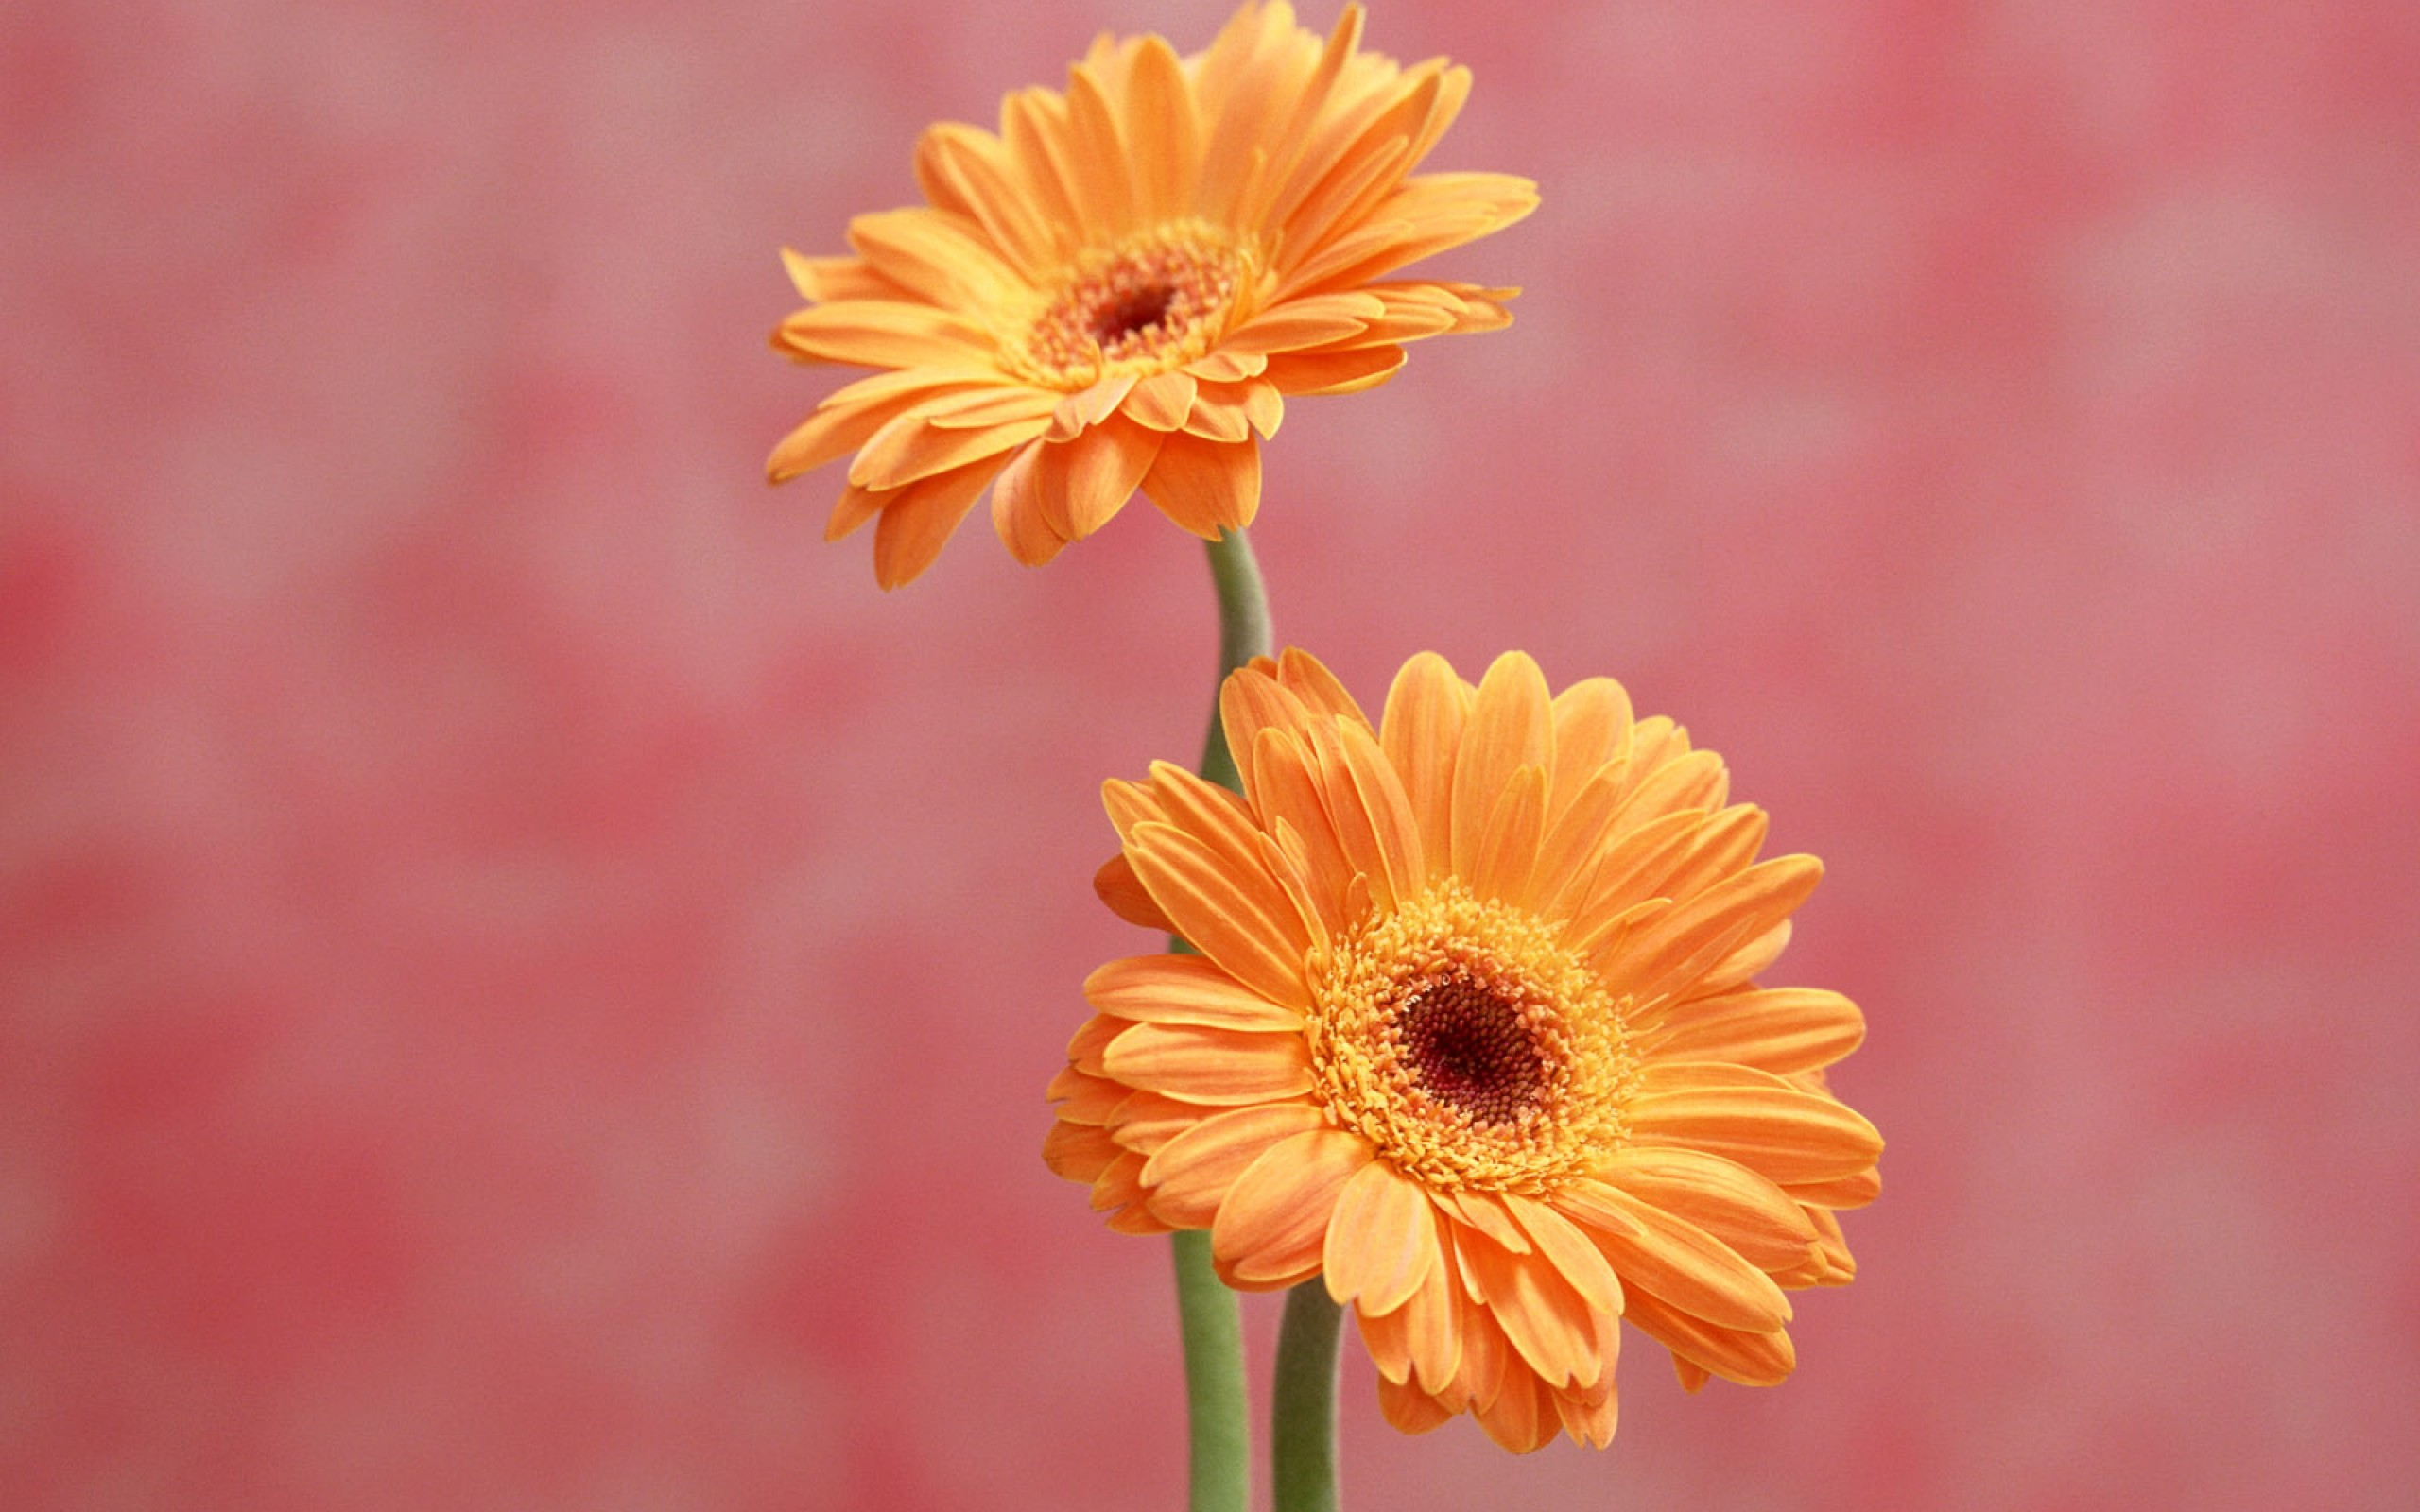 Flores bellas naranjas - 2560x1600